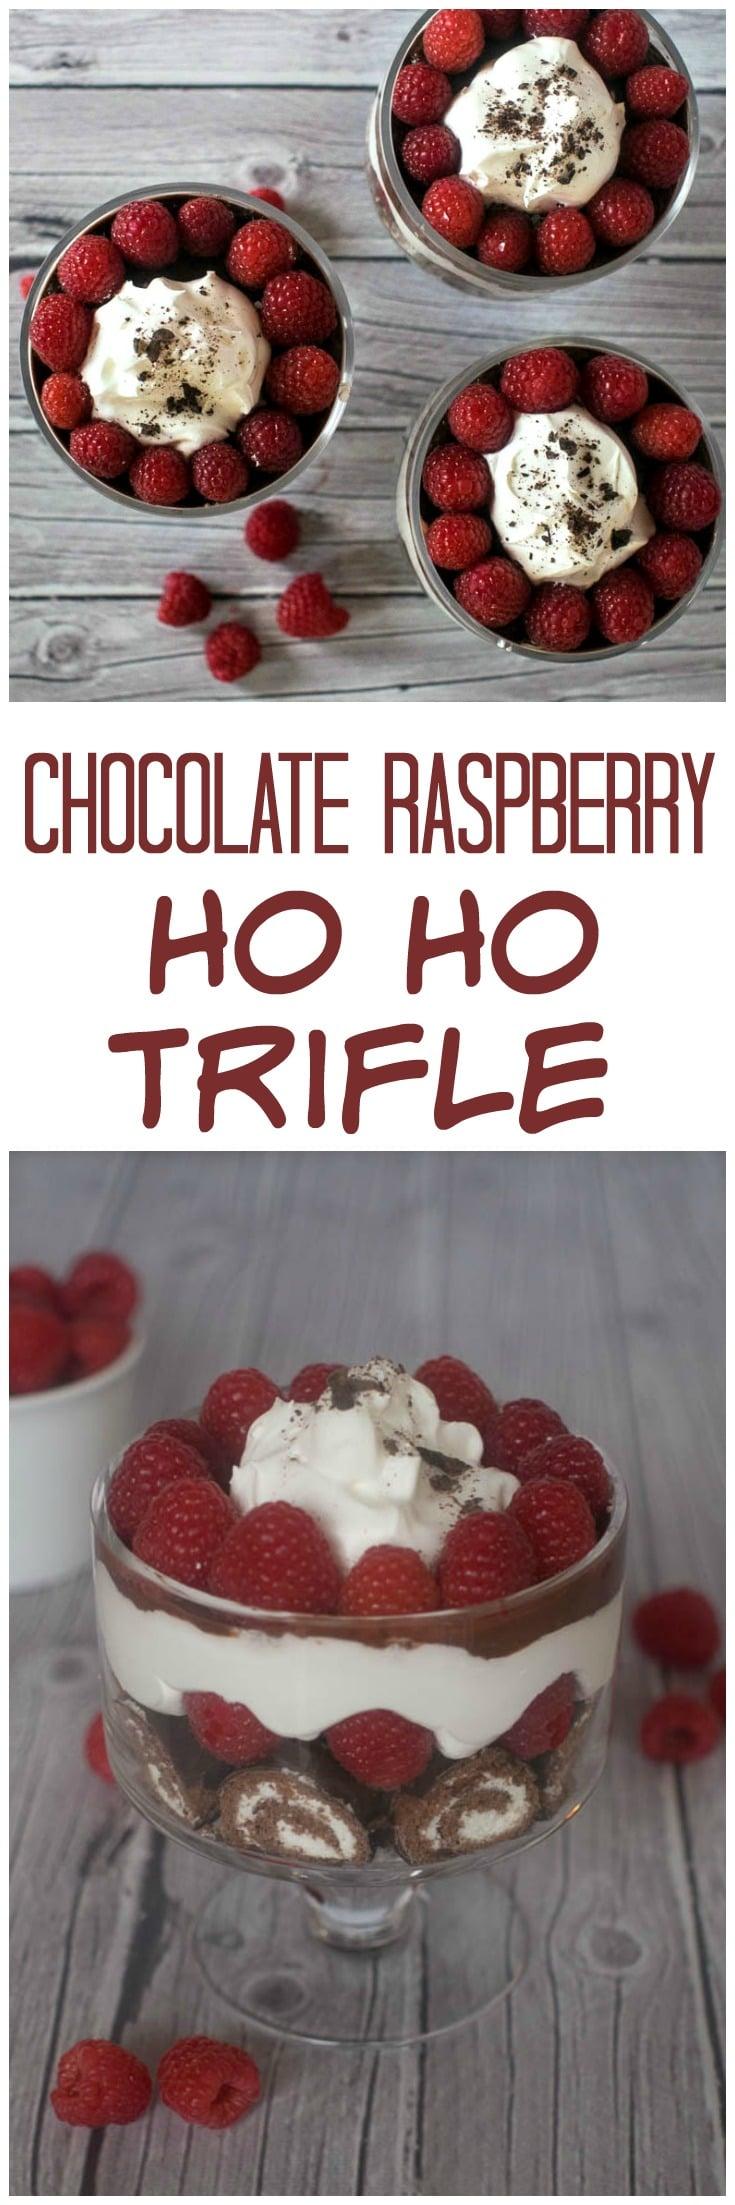 Chocolate Raspberry Ho Ho Trifle | Easy Dessert | Valentine's Day | HoHo | Trifle | 15 Minute Dessert